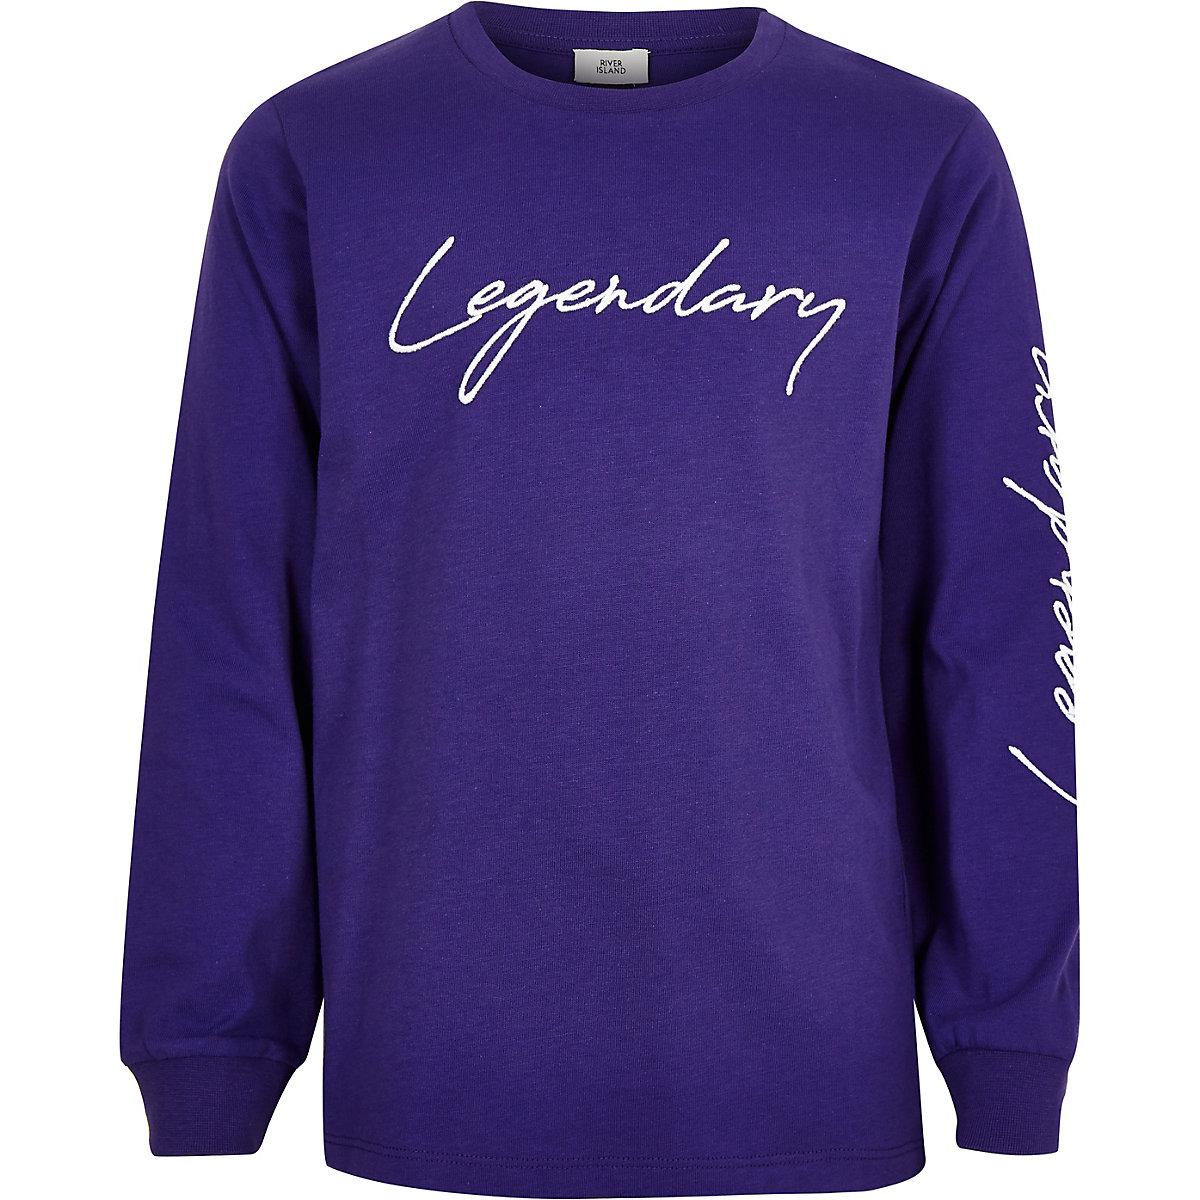 Boys purple 'legendary' embroidery sweatshirt